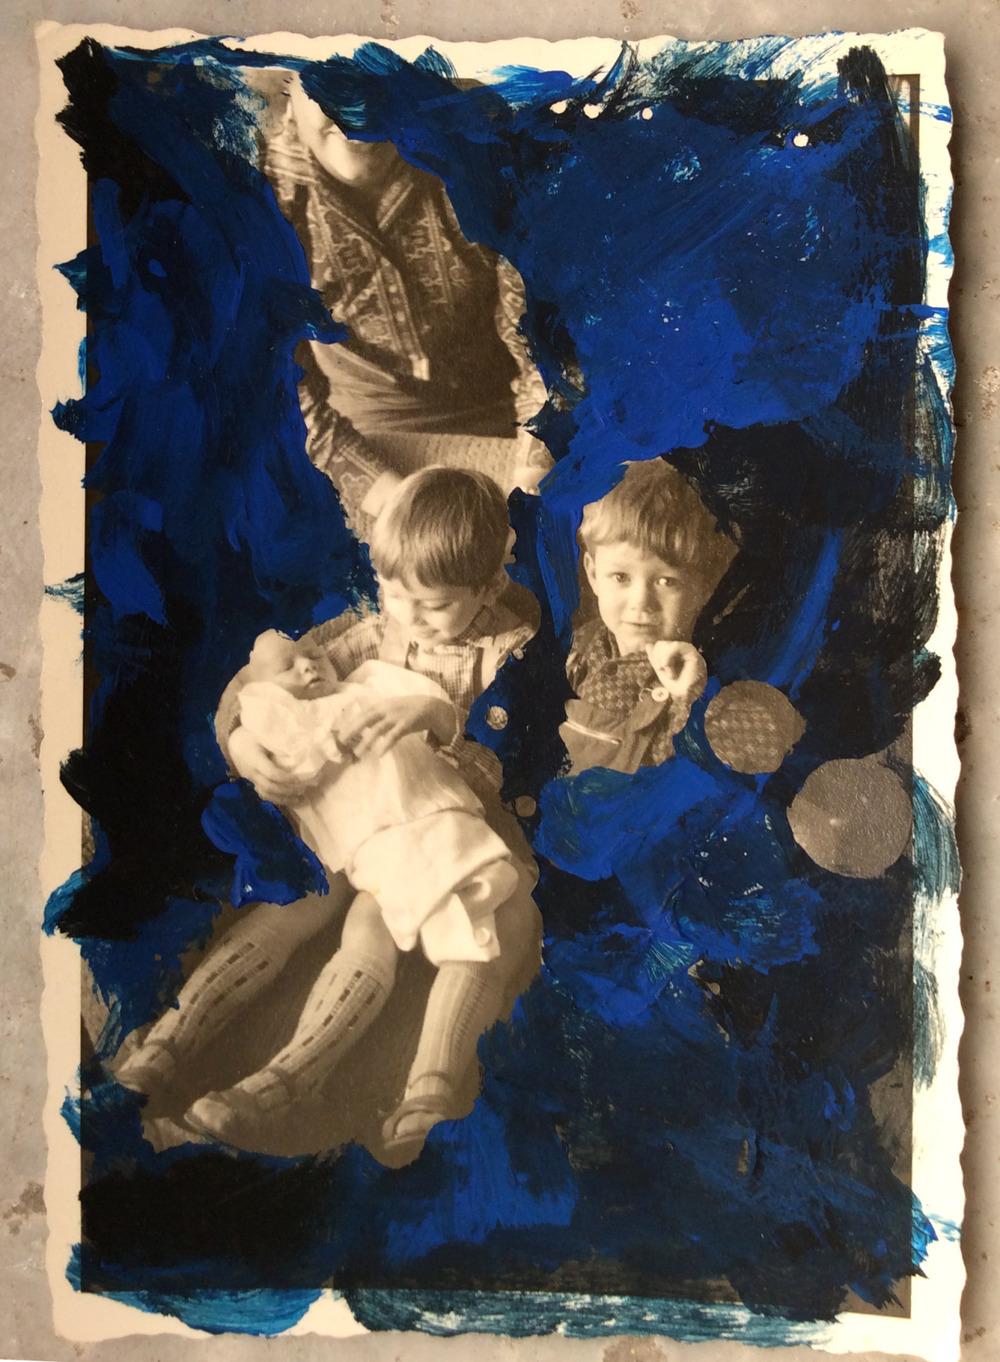 slowartday :   Rossana Taormina, Blu #4, 2014  (tecnica mista su vecchia foto, cm 10 x 7)   http://rossanataormina.tumblr.com/